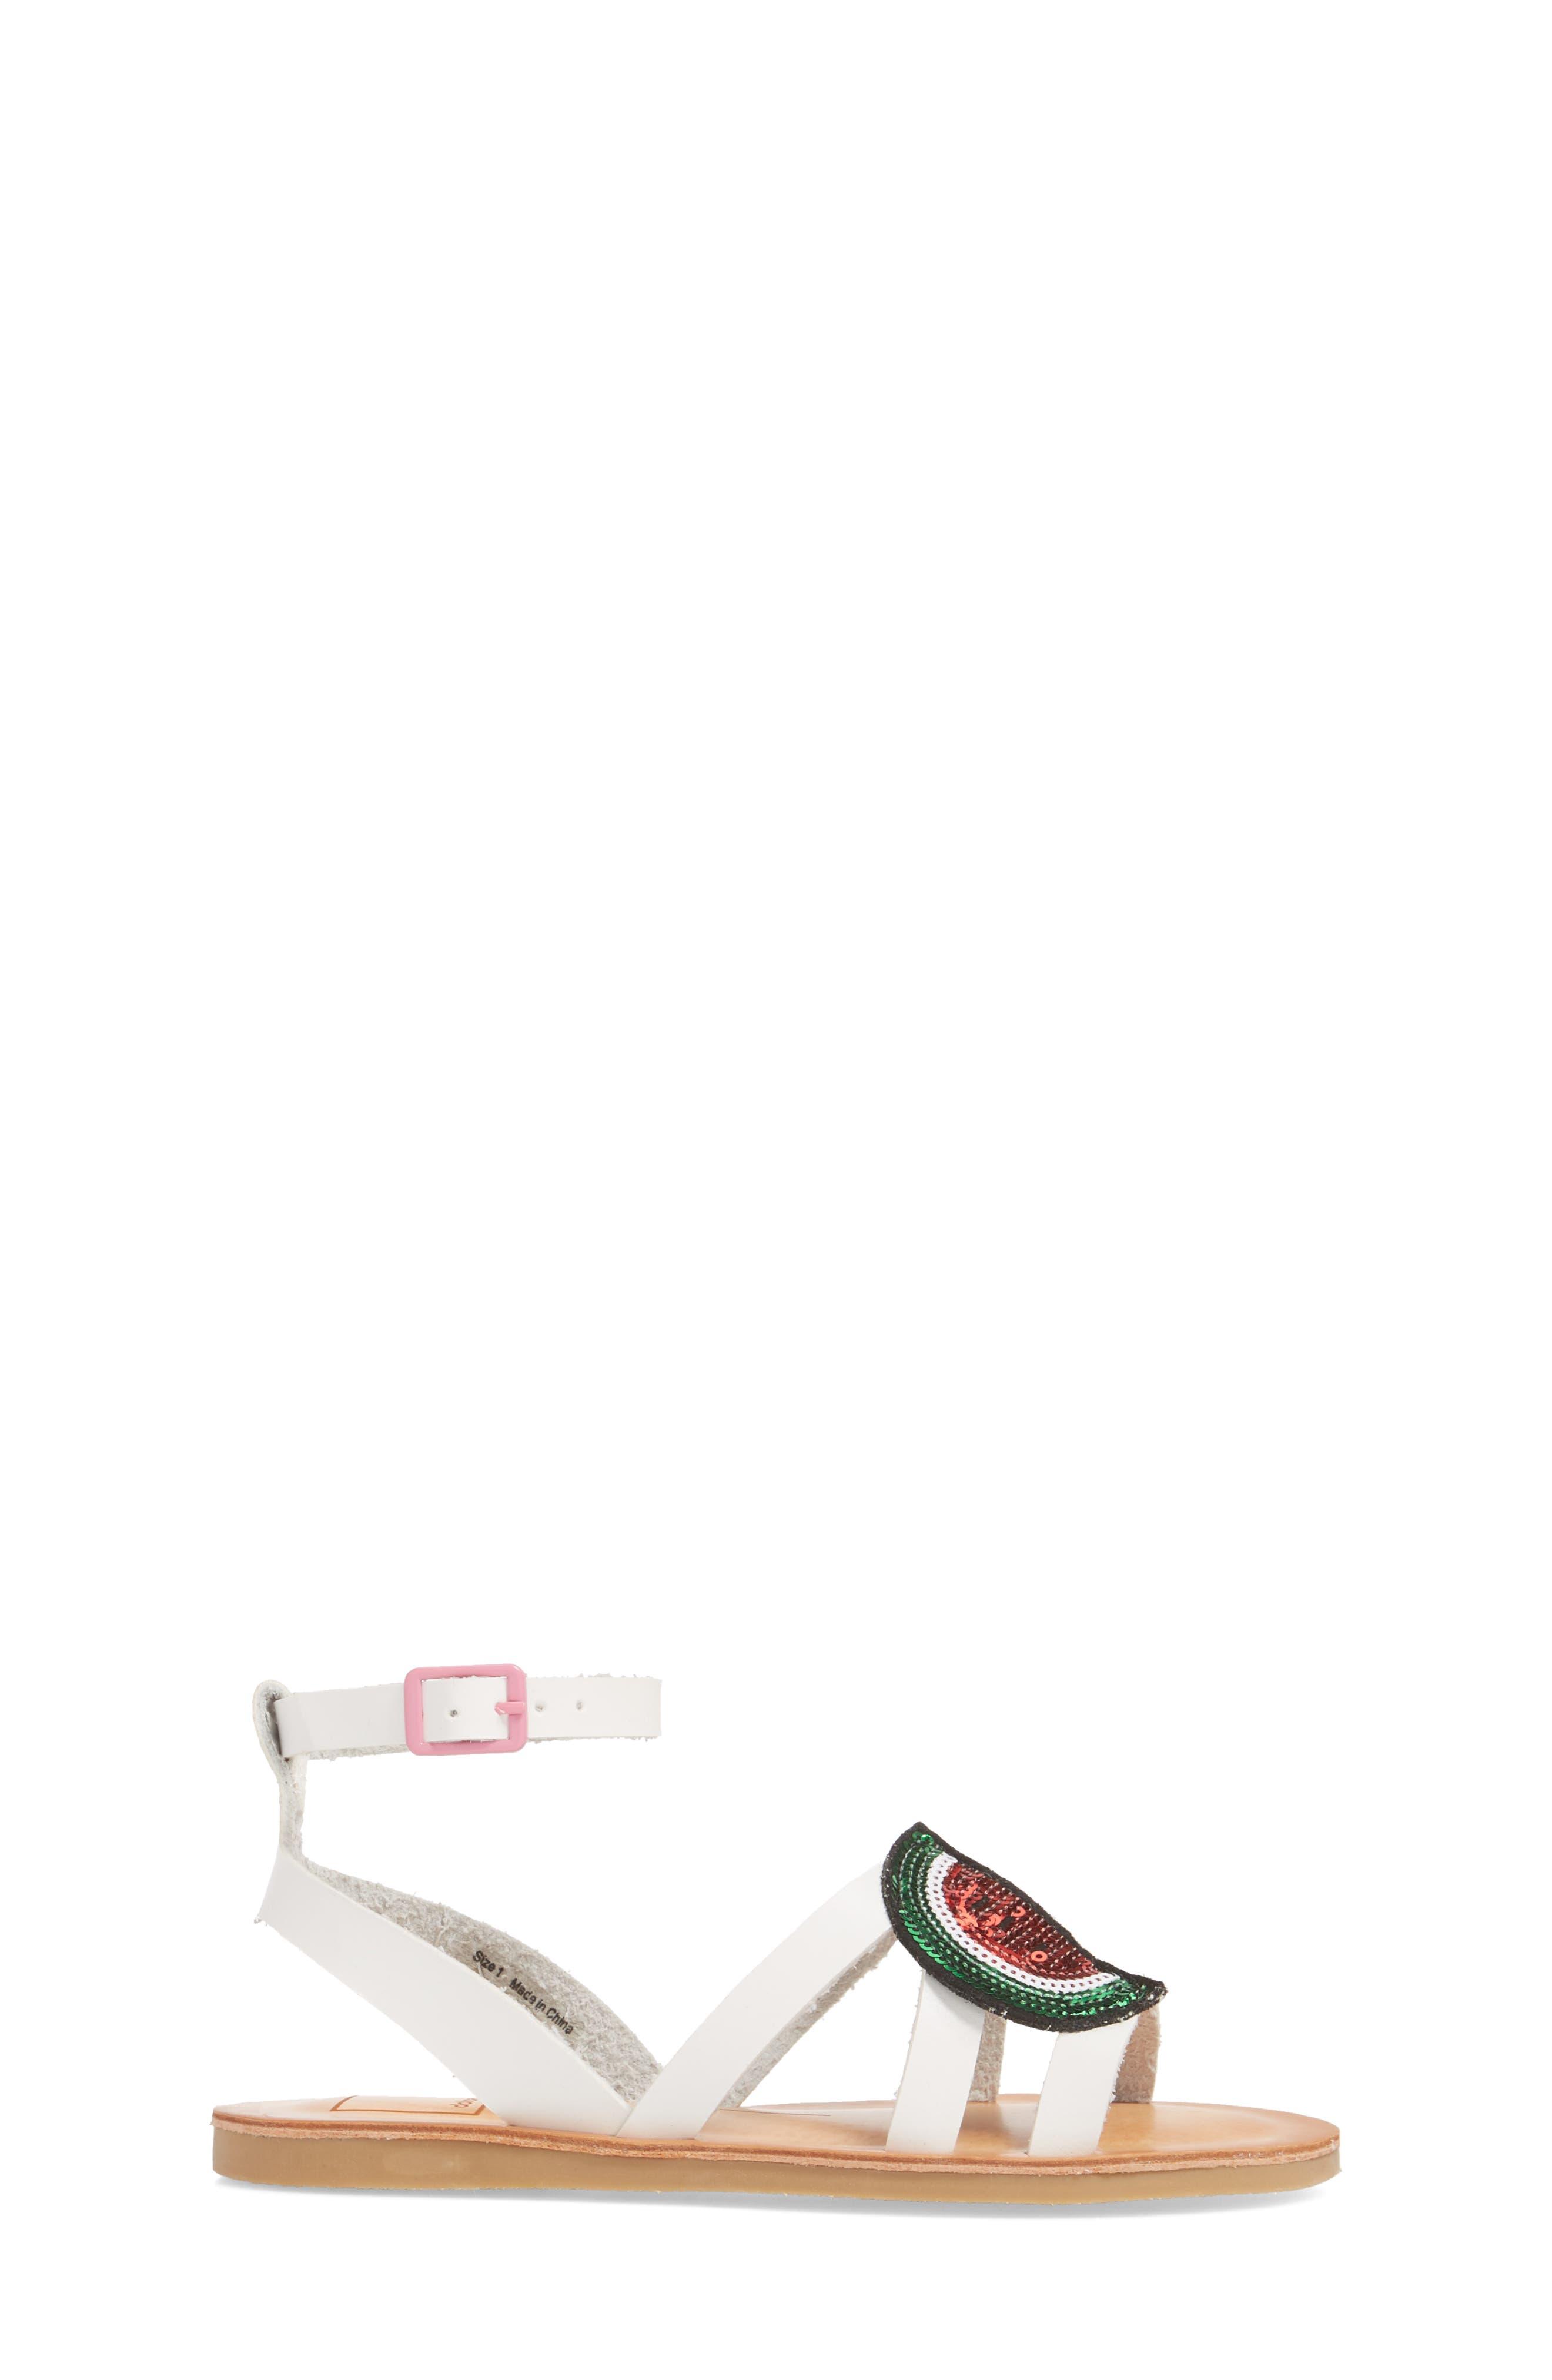 Jaclin Fruit Sequined Sandal,                             Alternate thumbnail 3, color,                             White